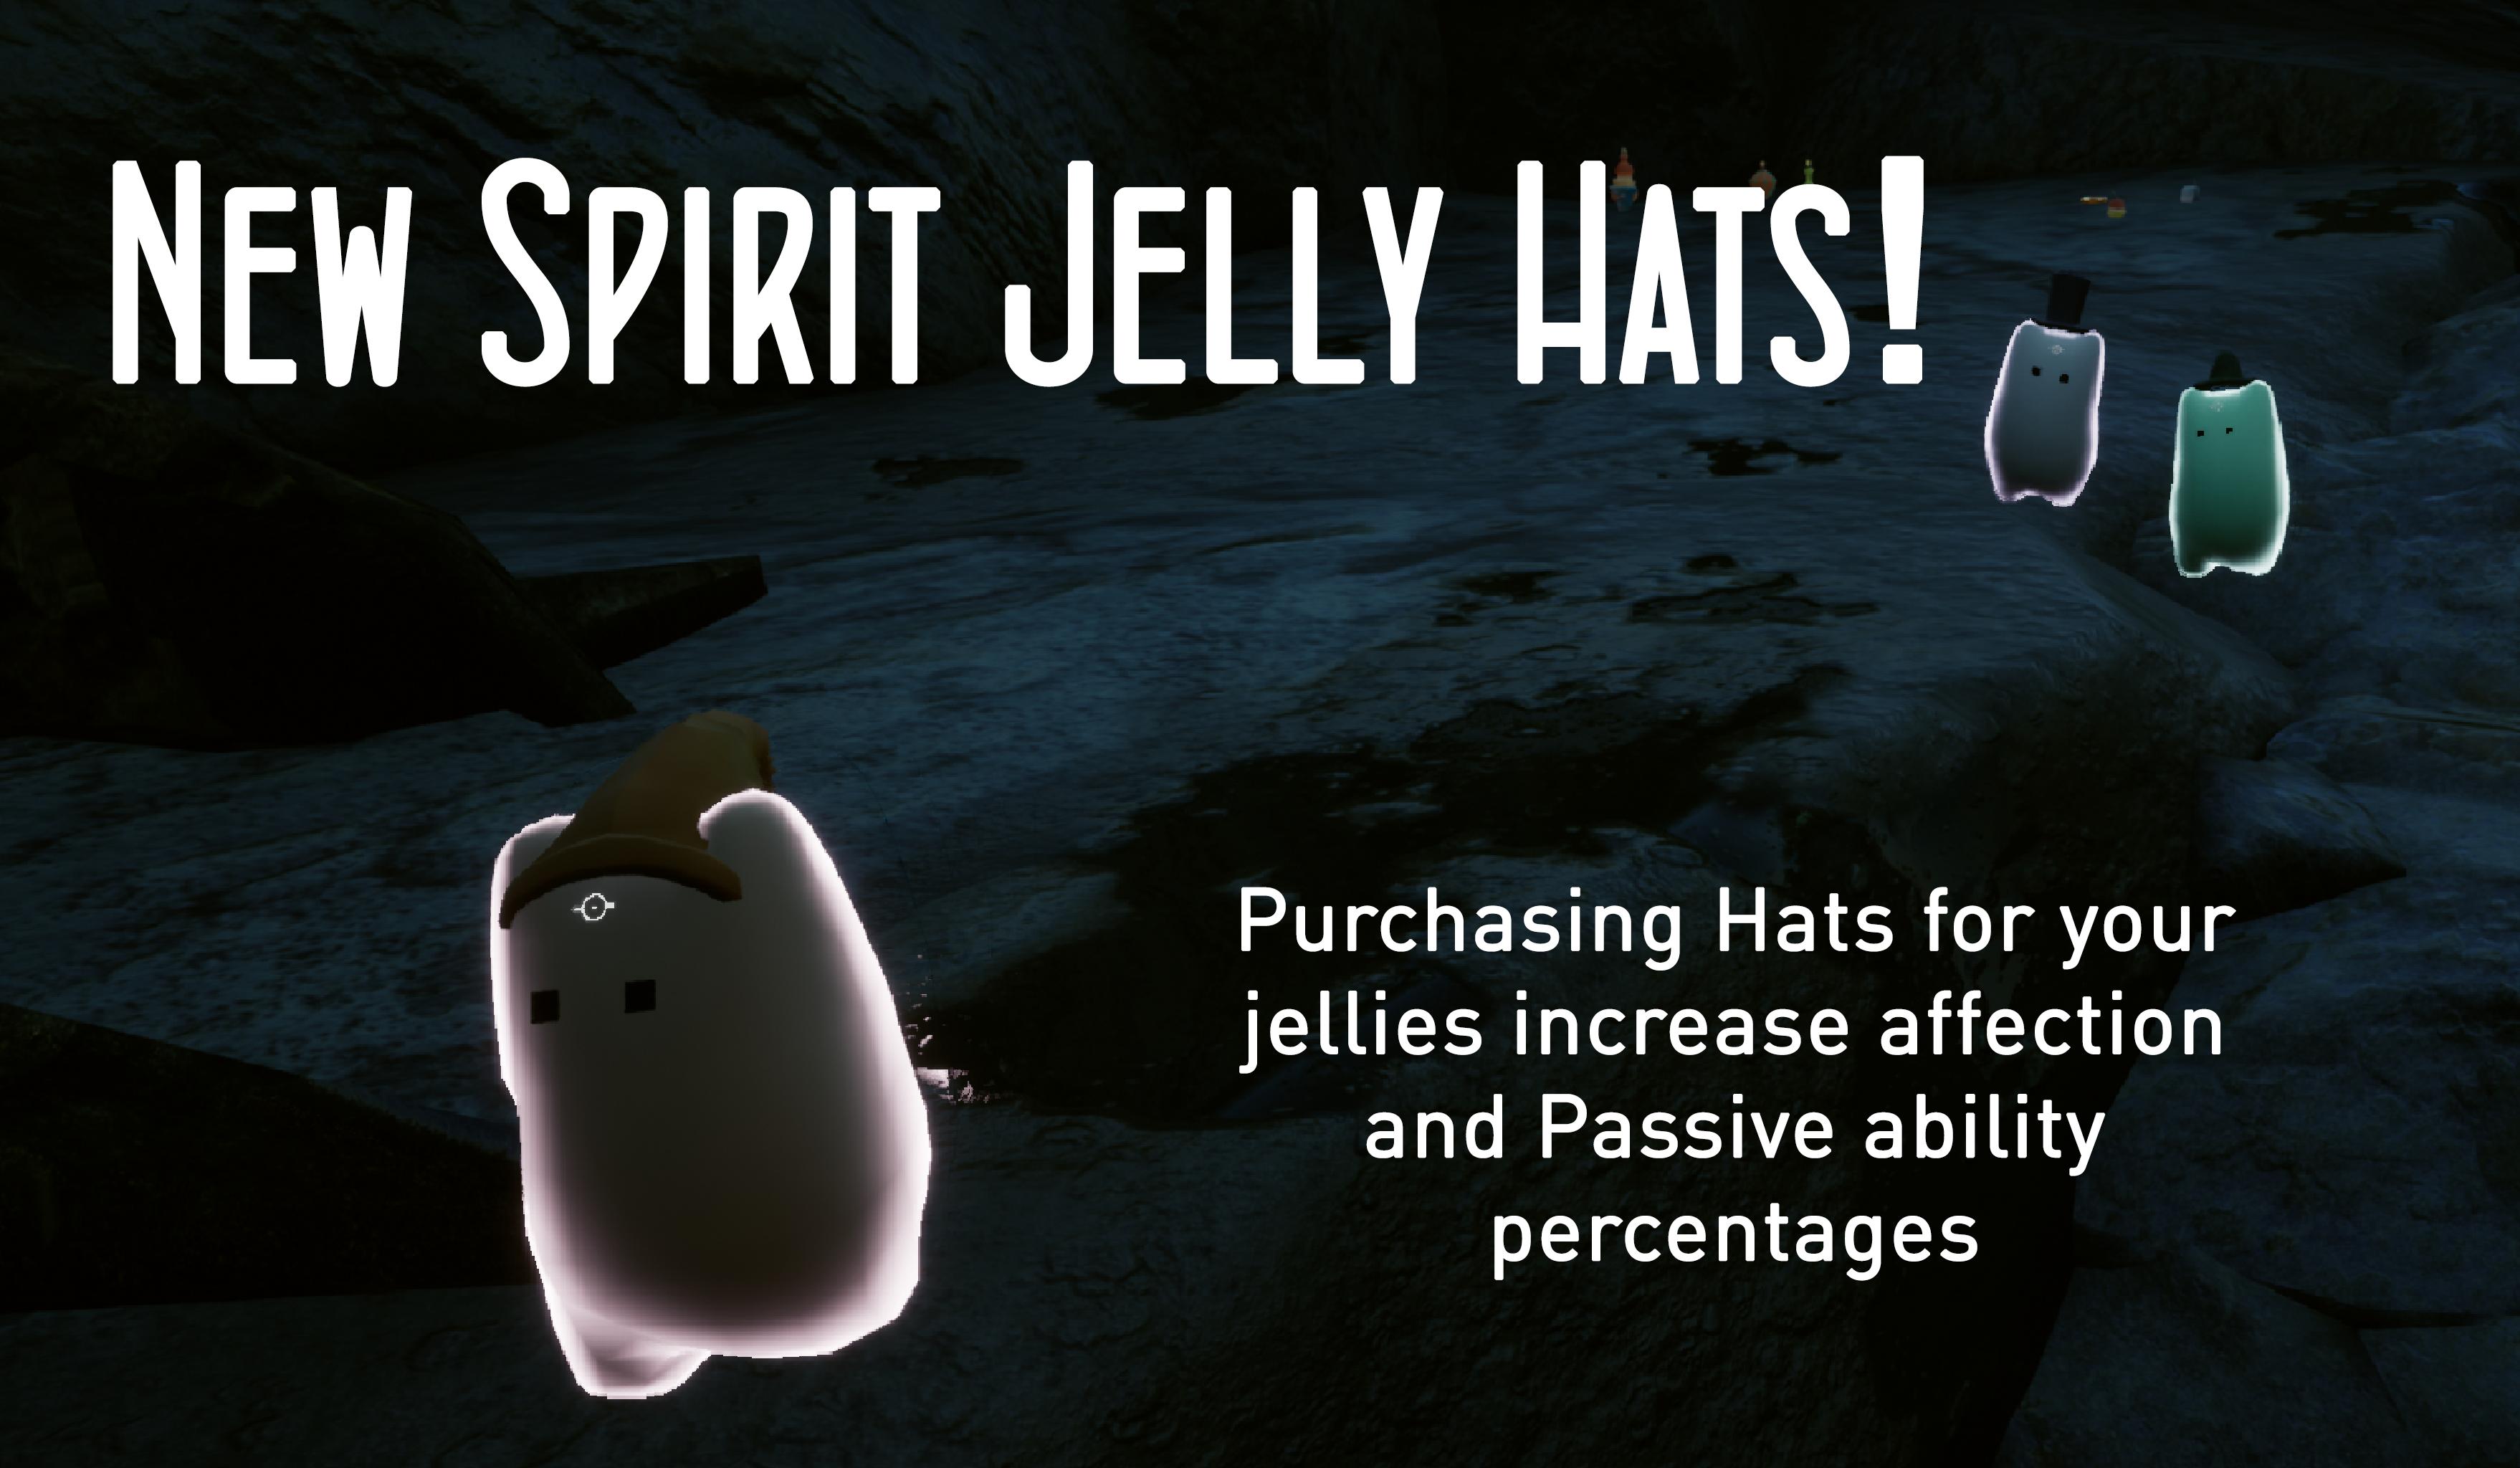 SpiritJellyHats